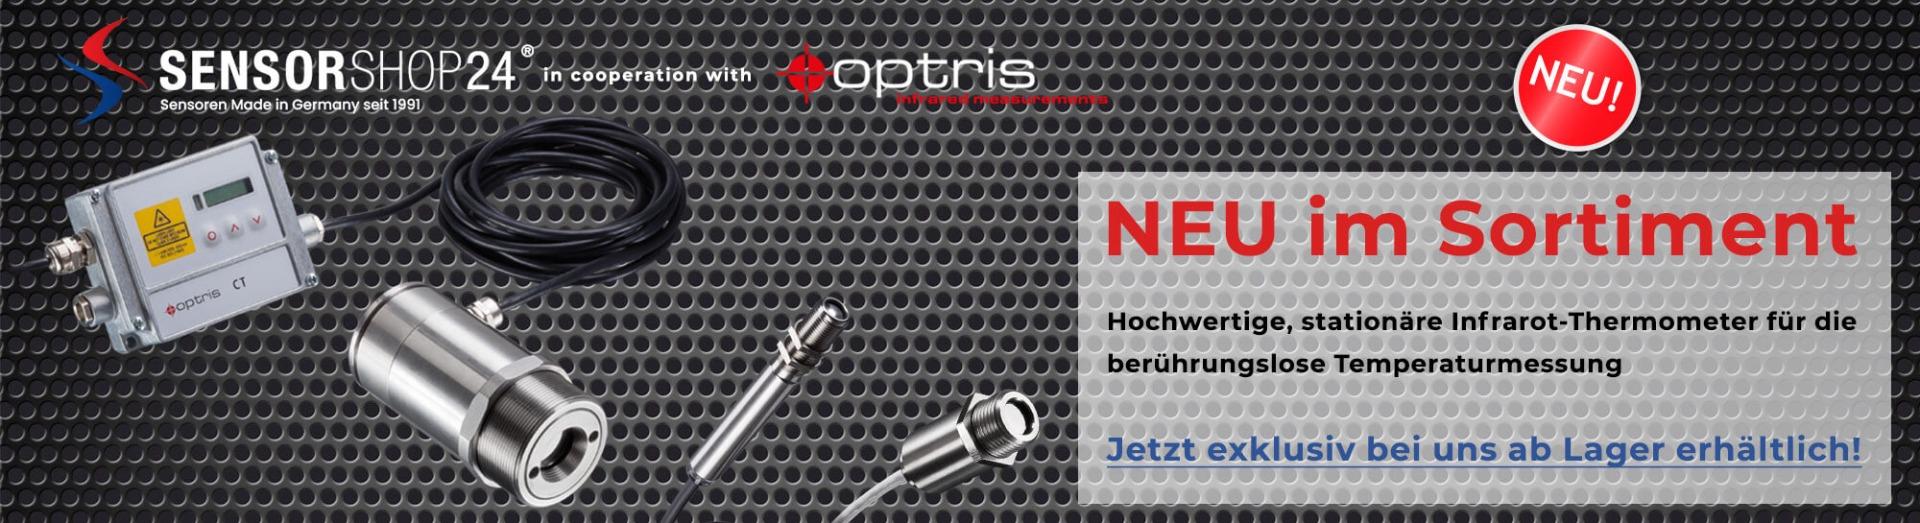 Neu im Sortiment - Optris Infrarot-Thermometer